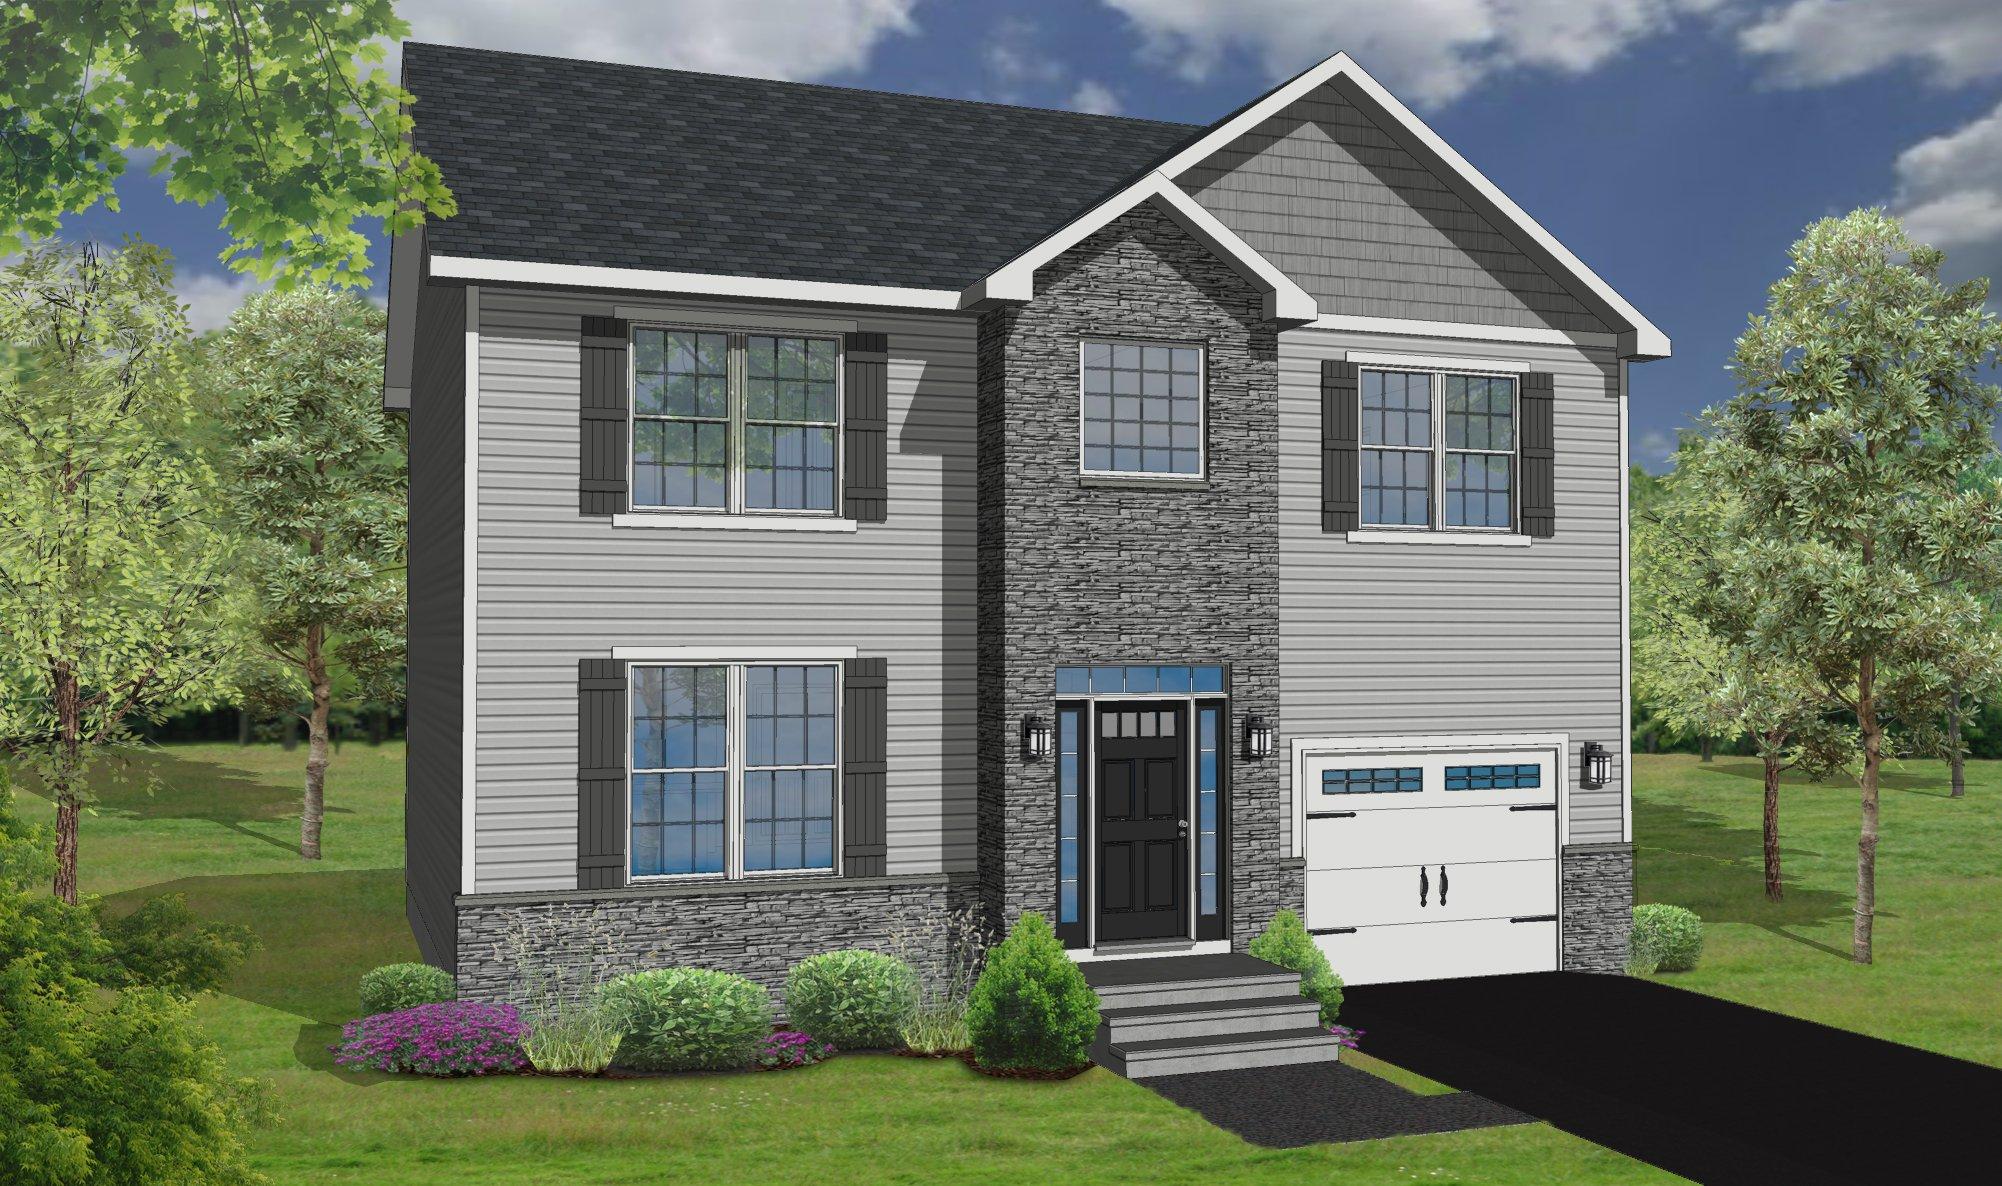 The April Home Model Rendering